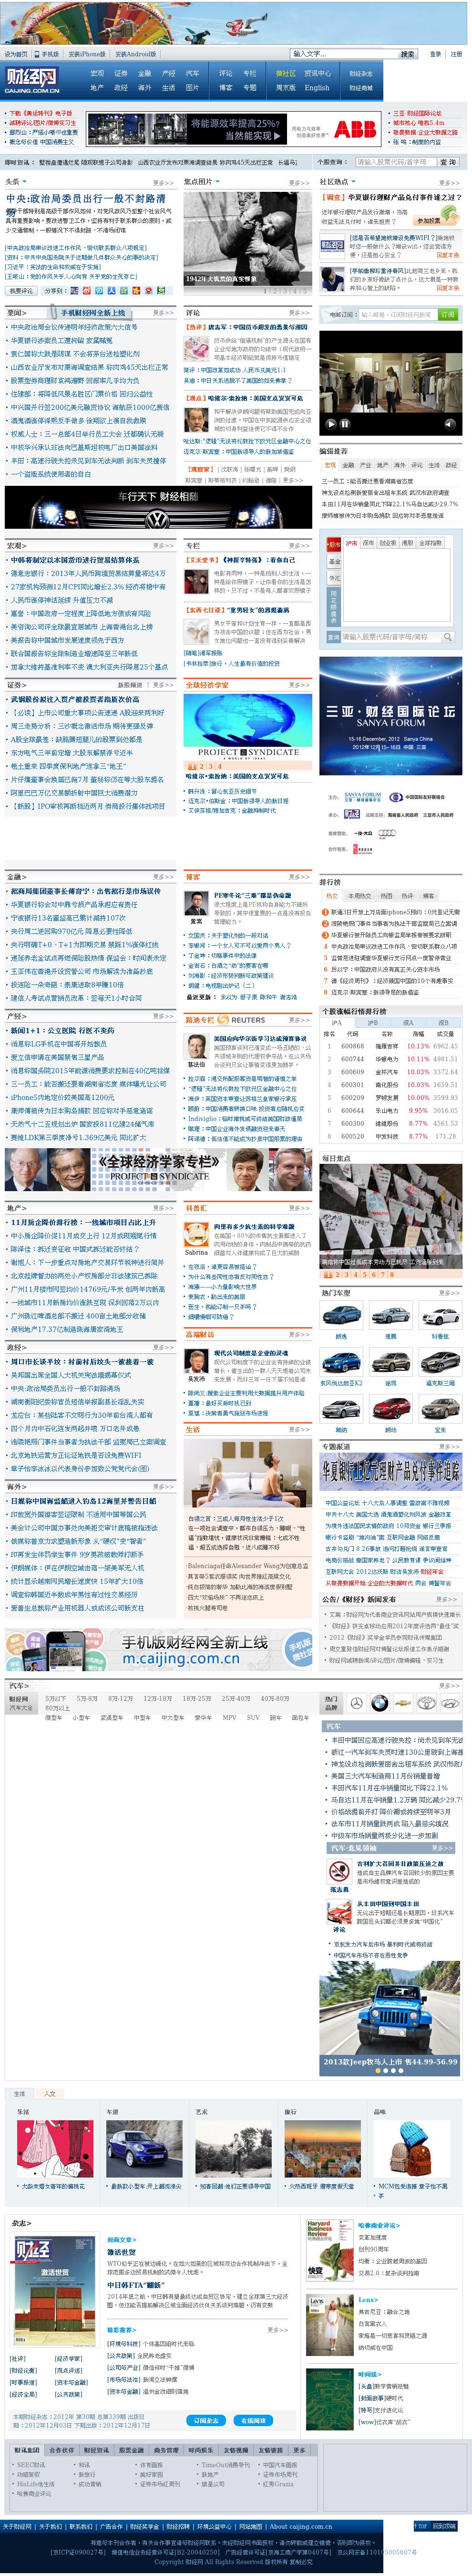 Caijing at Wednesday Dec. 5, 2012, 12:03 a.m. UTC